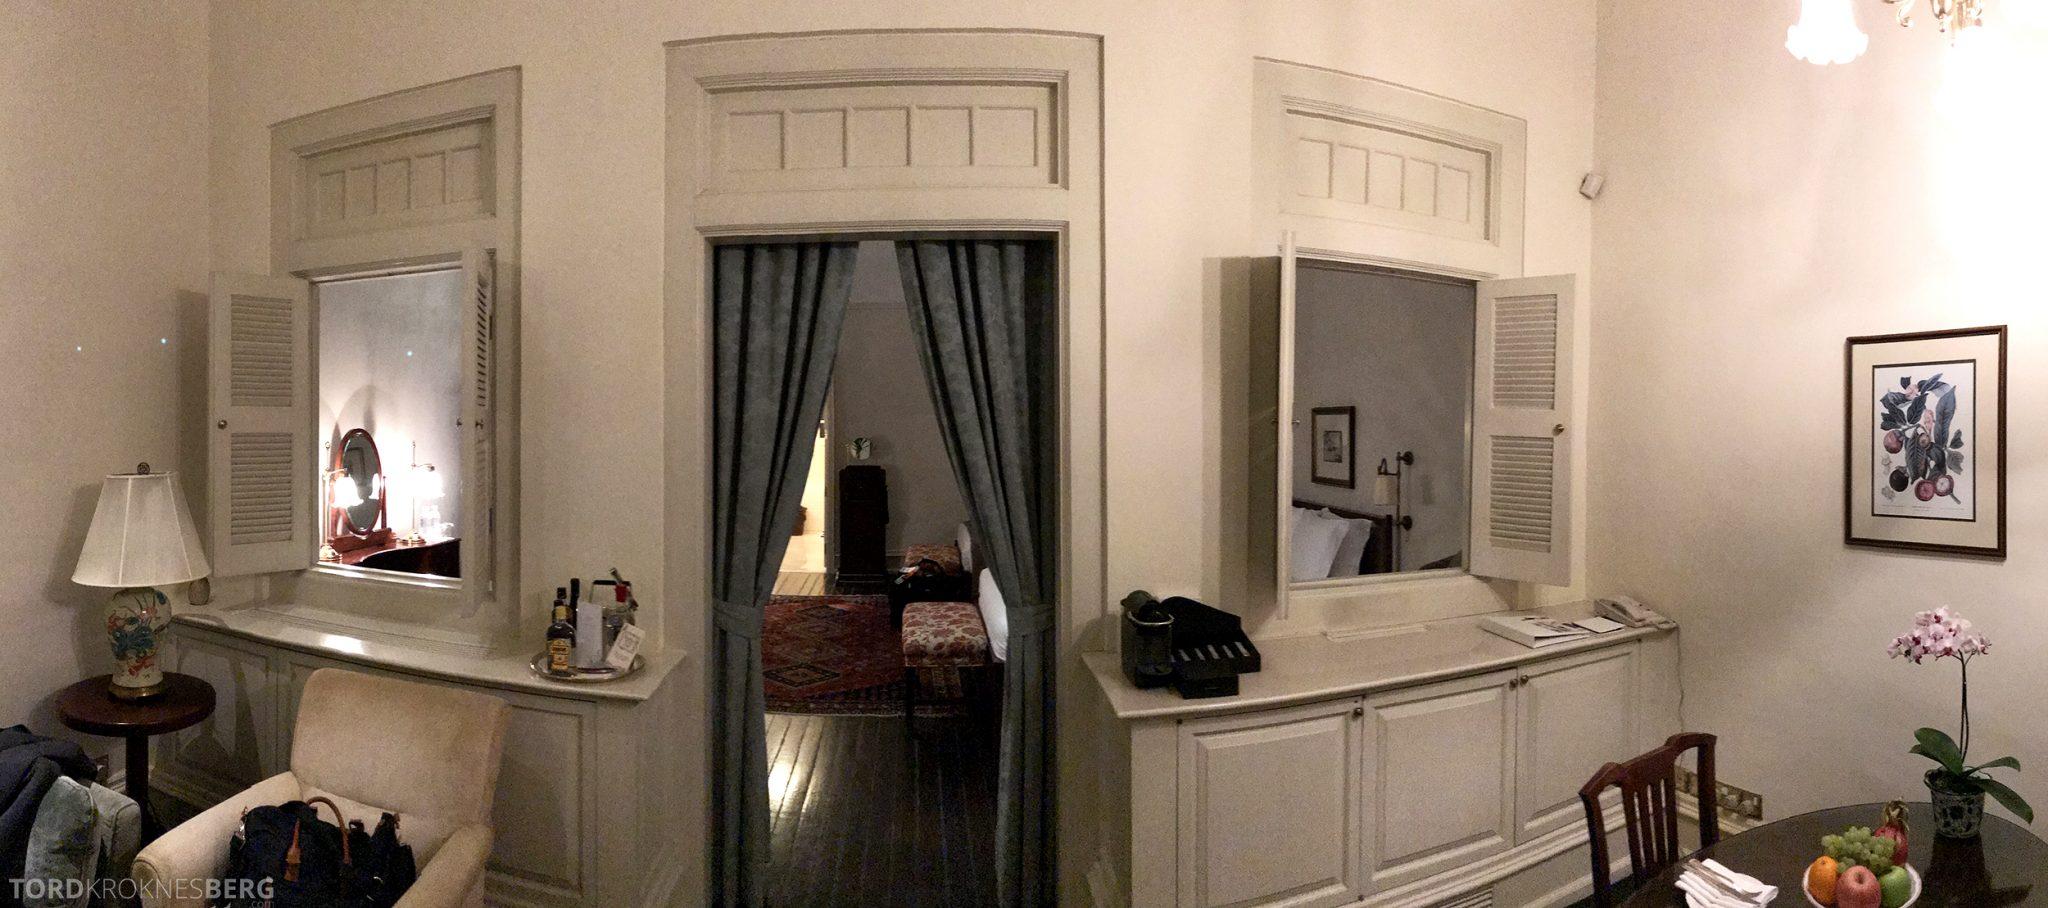 Raffles Hotel Singapore panorama rom